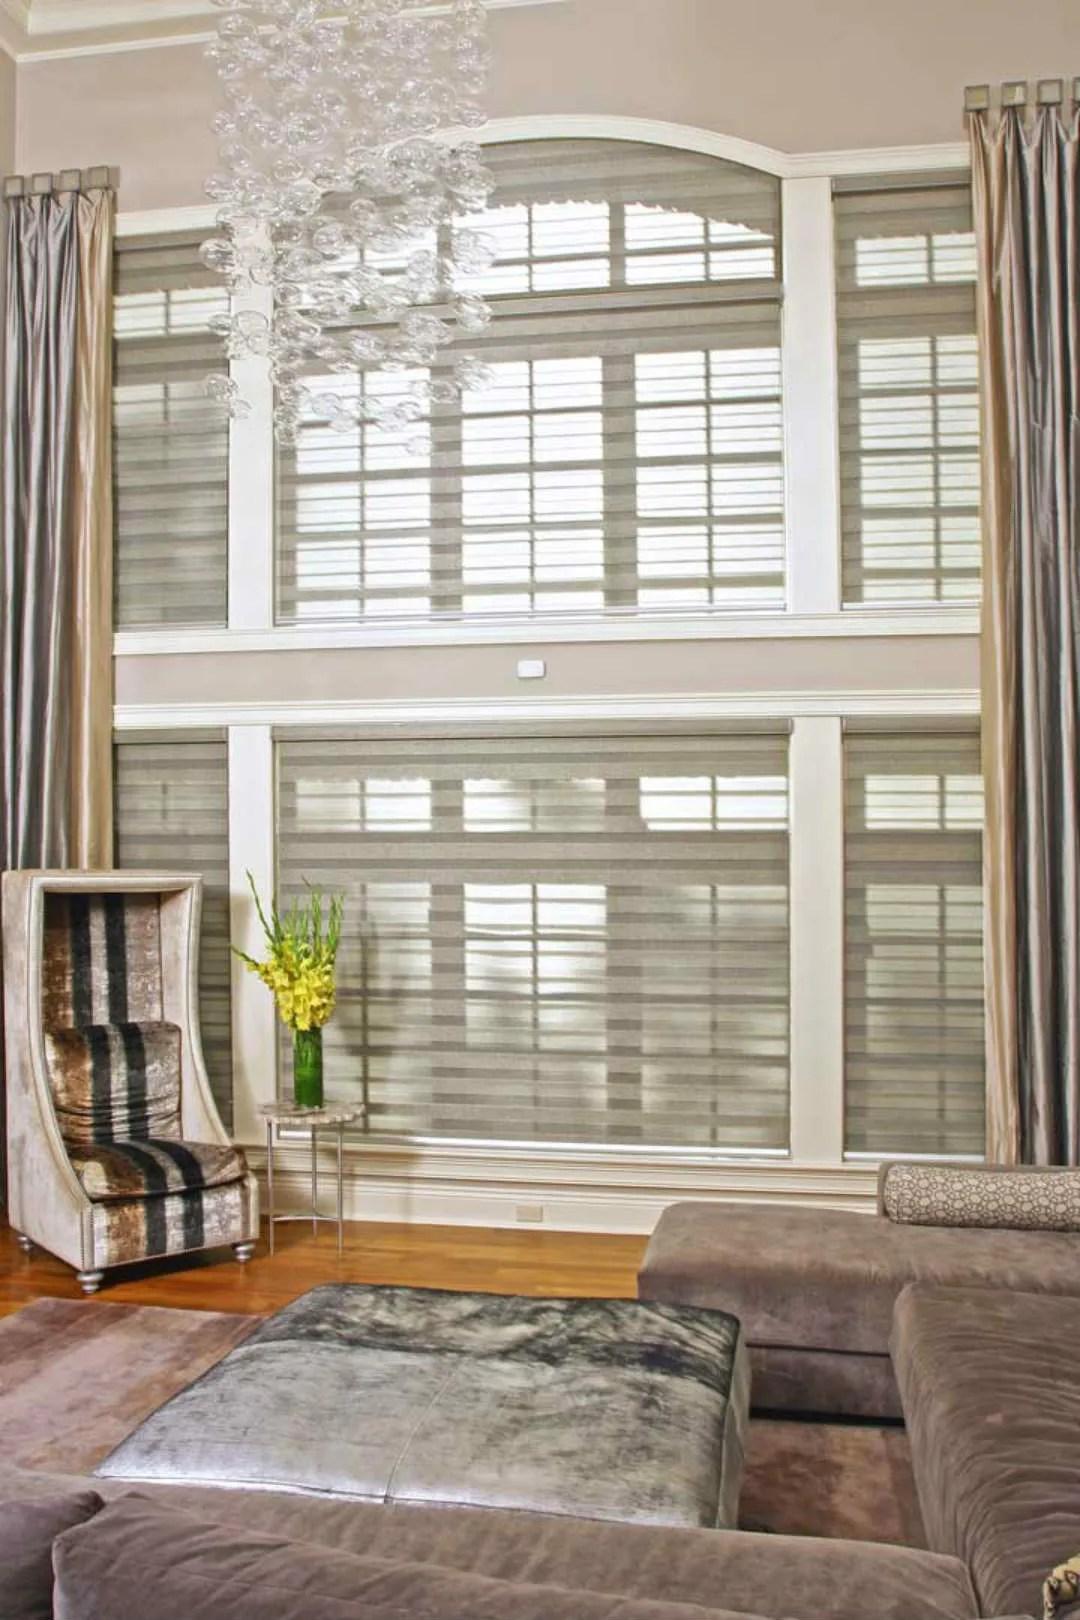 Naperville Home Design, Burr Ridge Home Design, Bedding, Curtains, Custom  Designs,